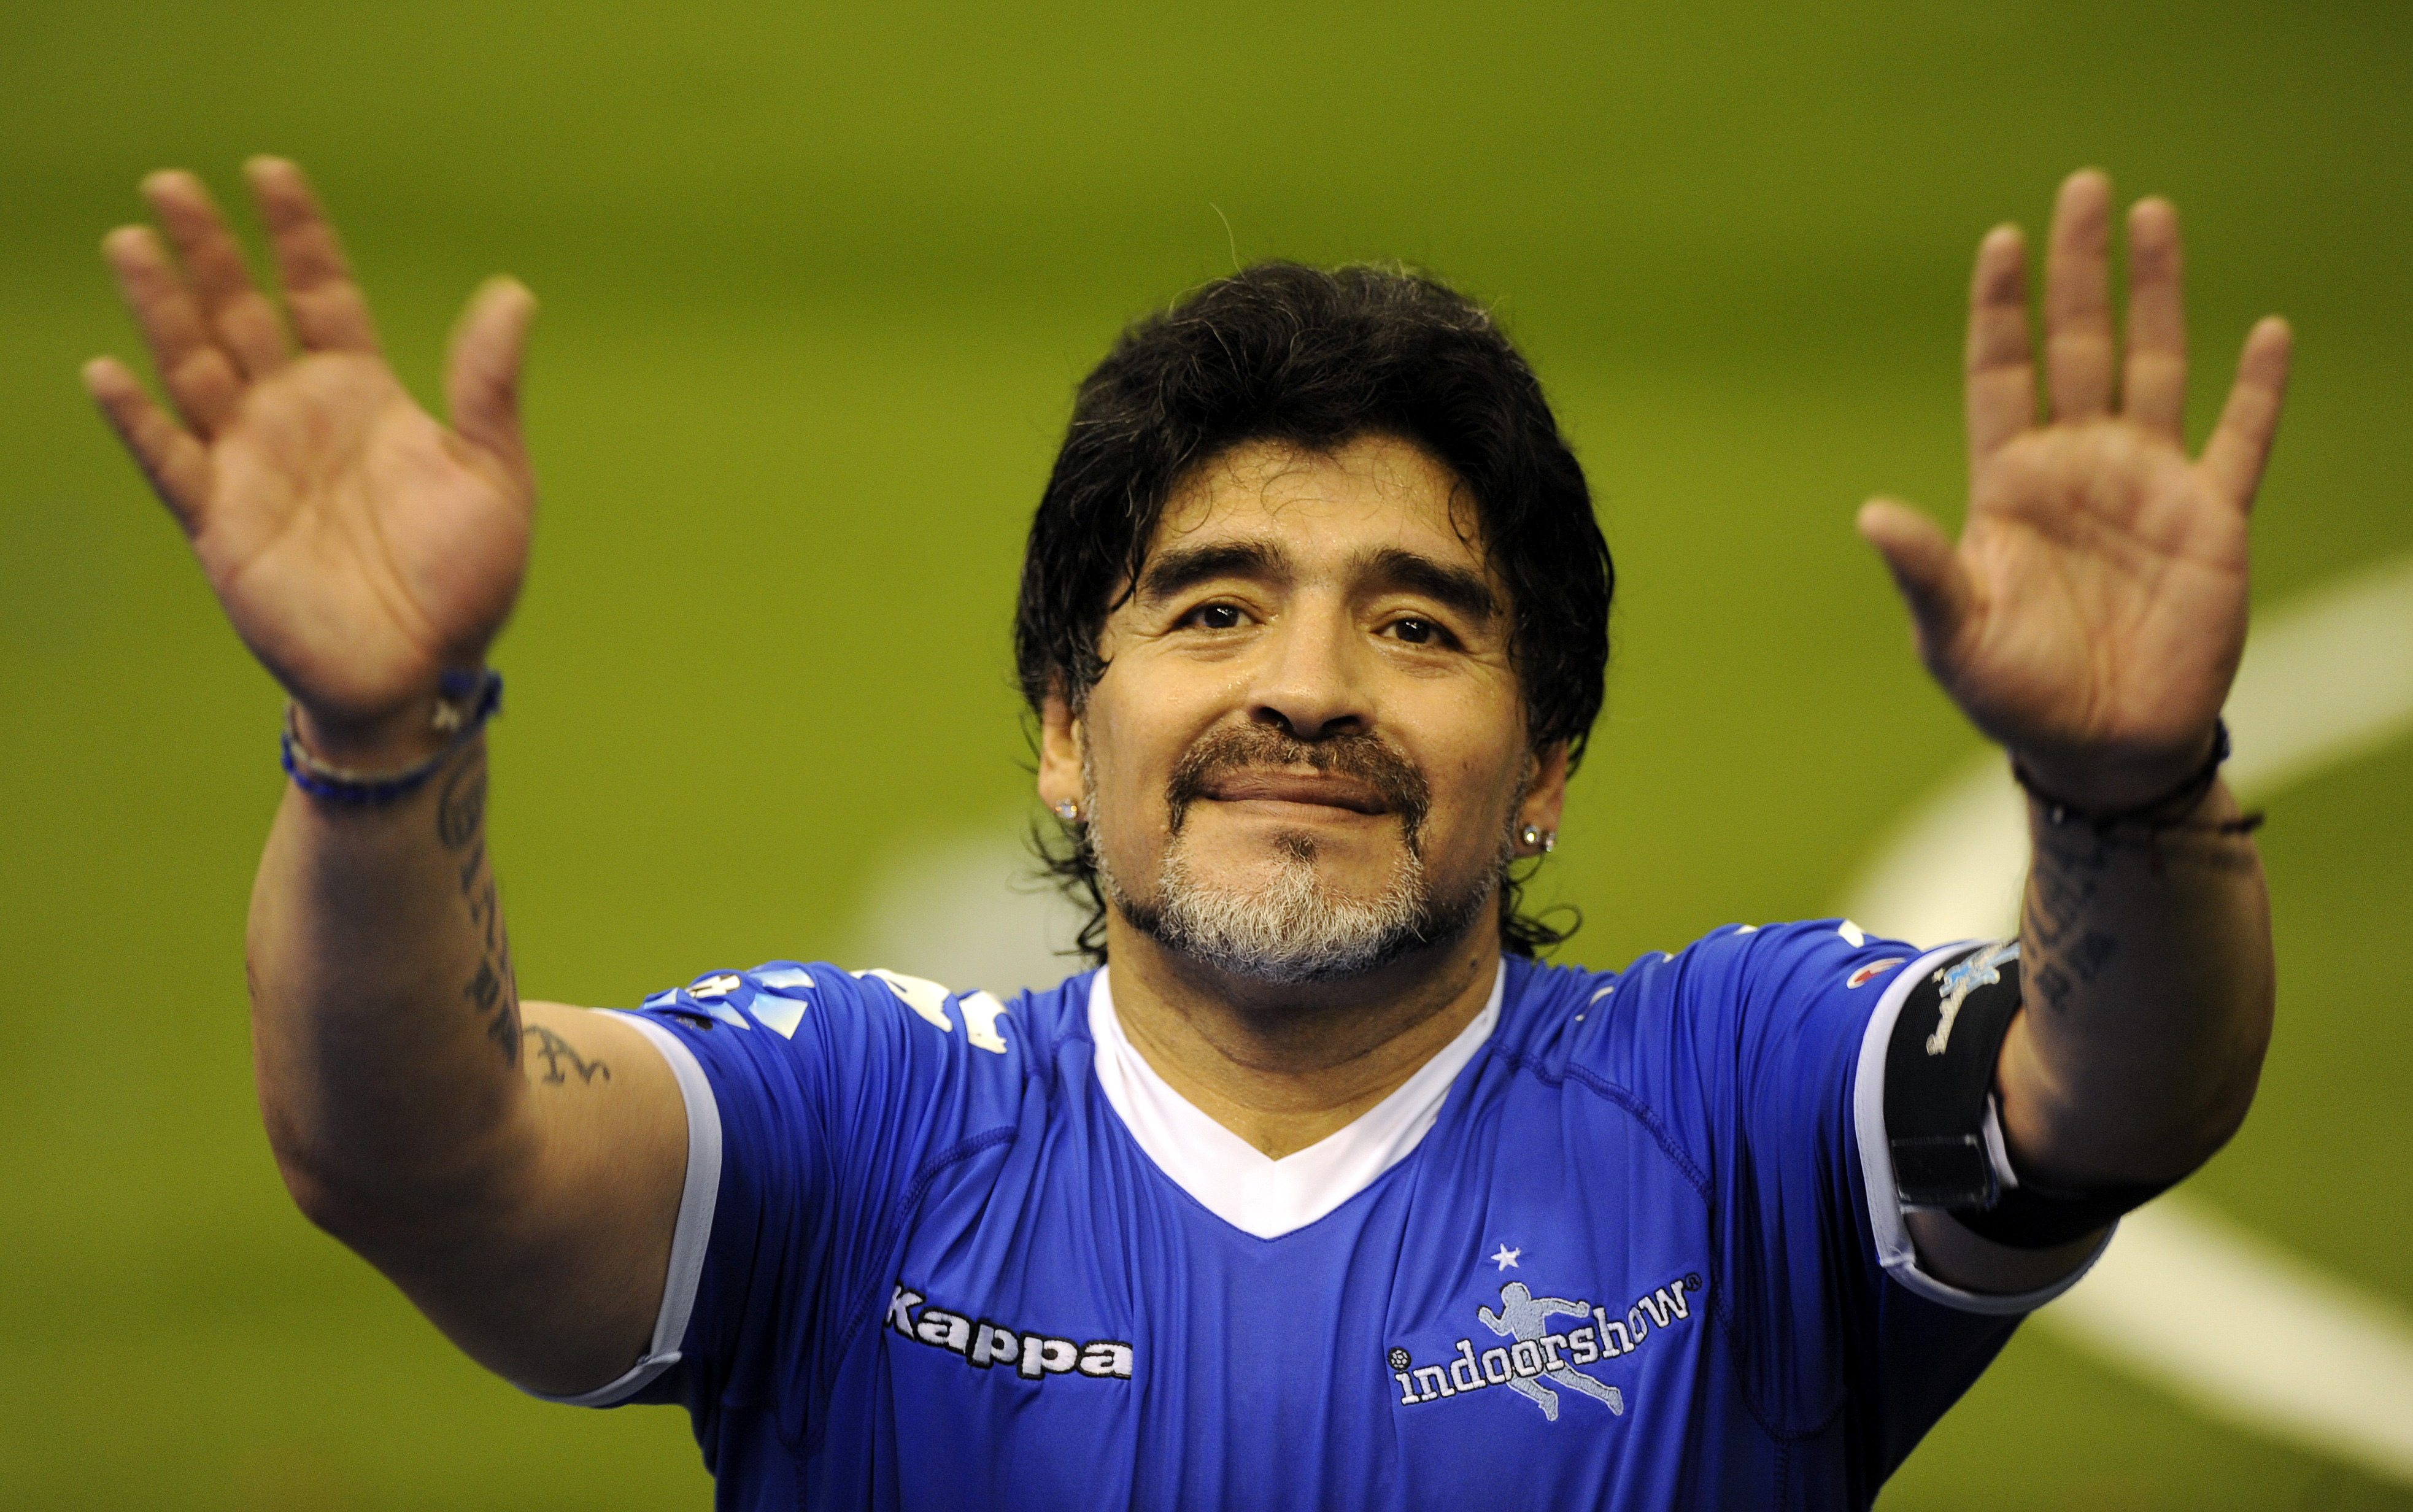 Maradona Cristiano México Sismo Neymar mensaje